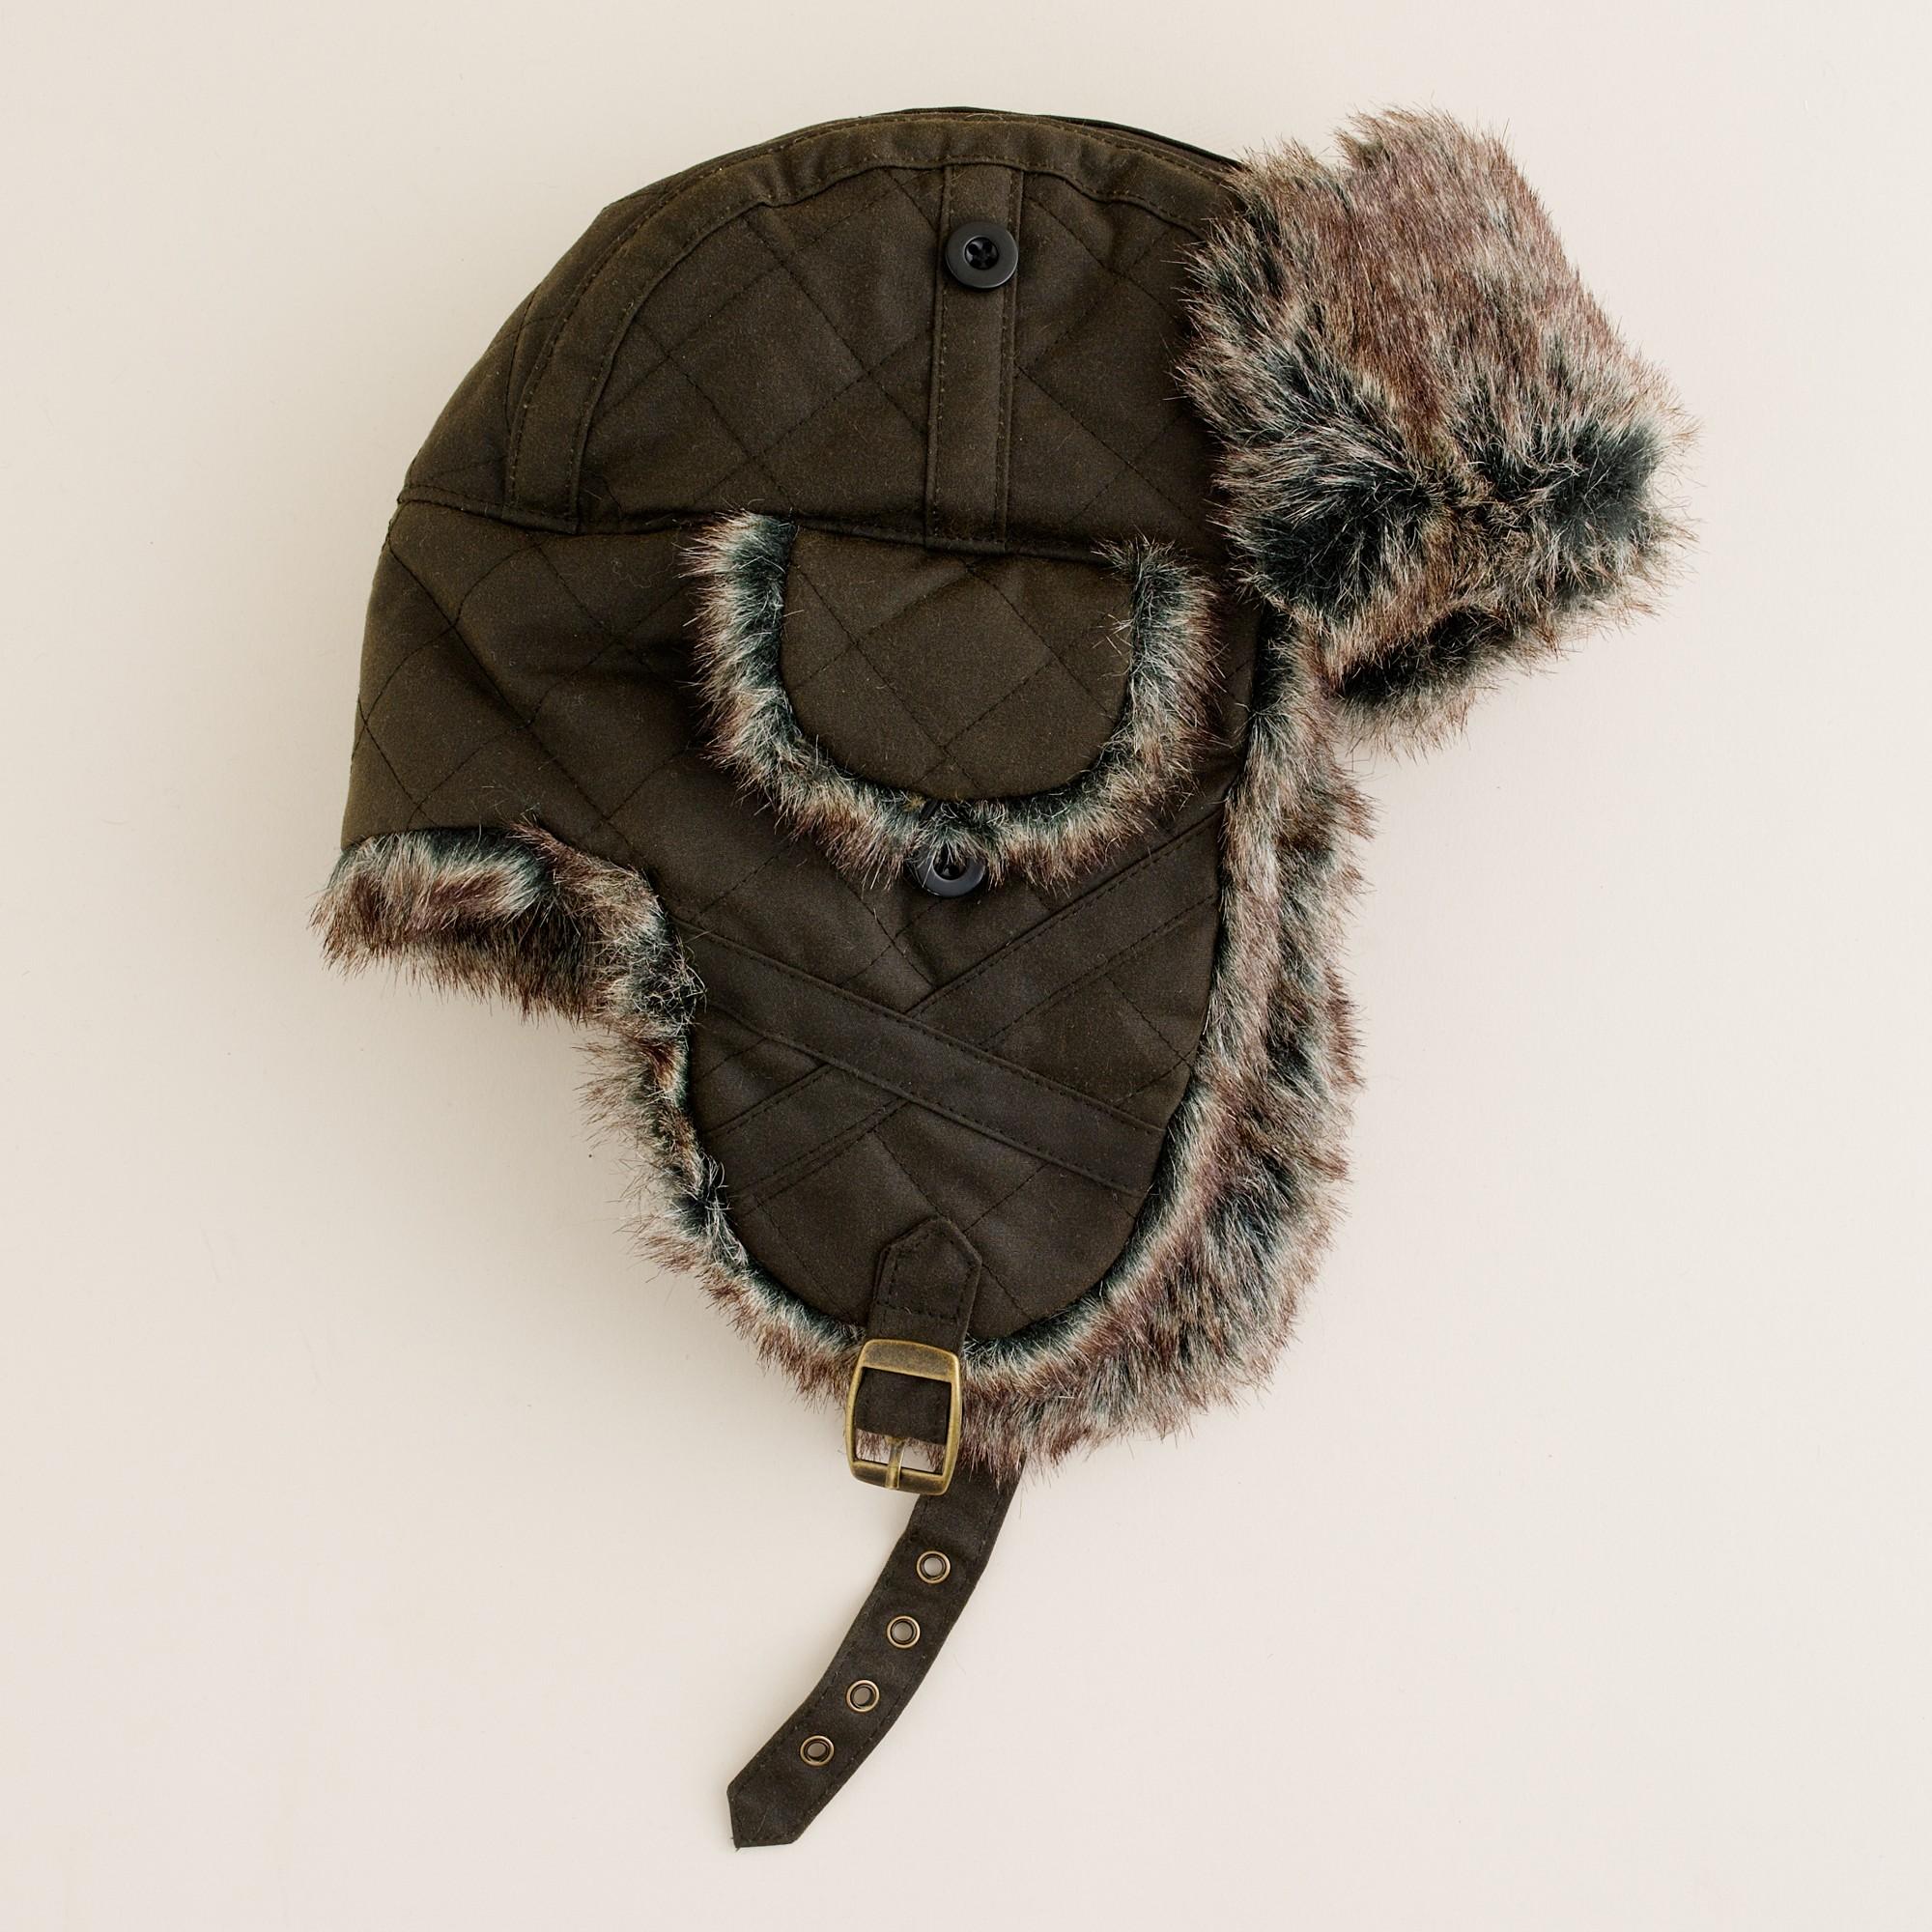 Lyst - J.Crew Barbour® Trapper Hat in Green for Men 12da2ef39f0